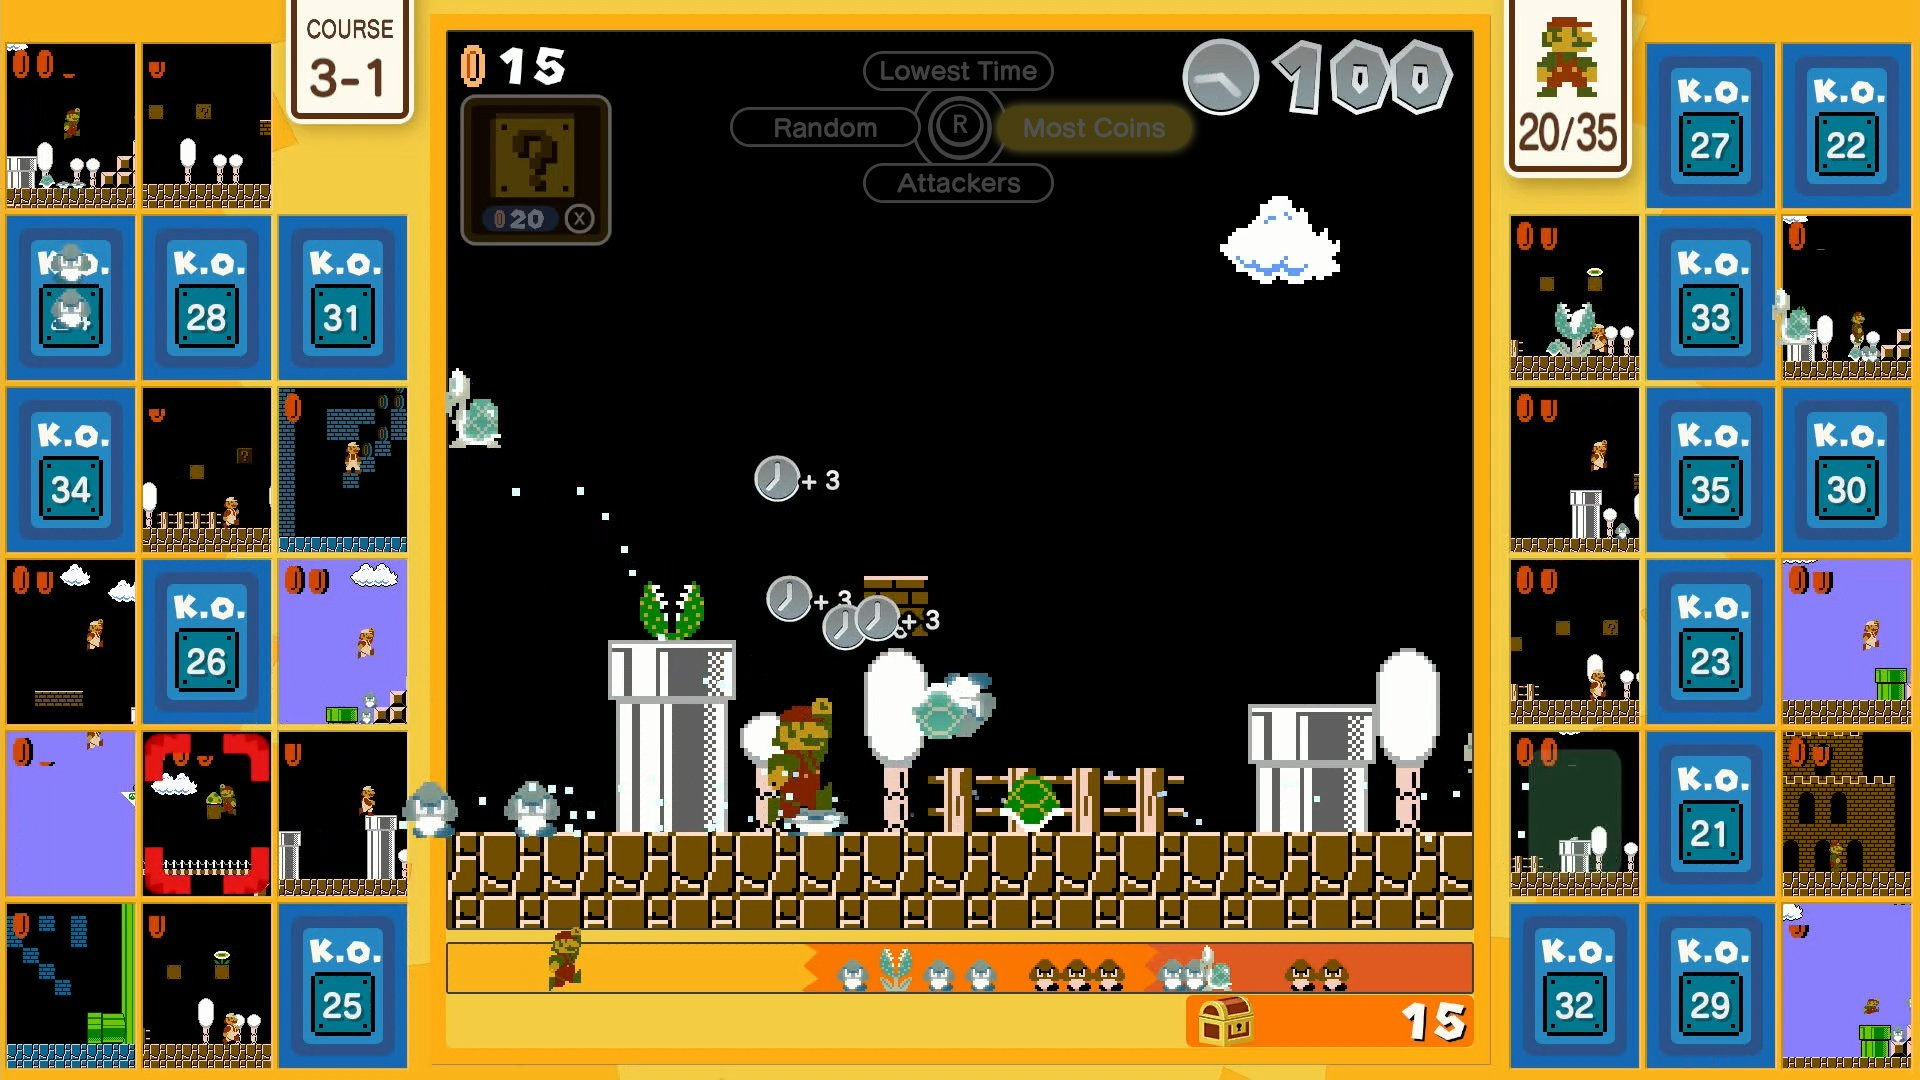 Super Mario Bros. 35 review